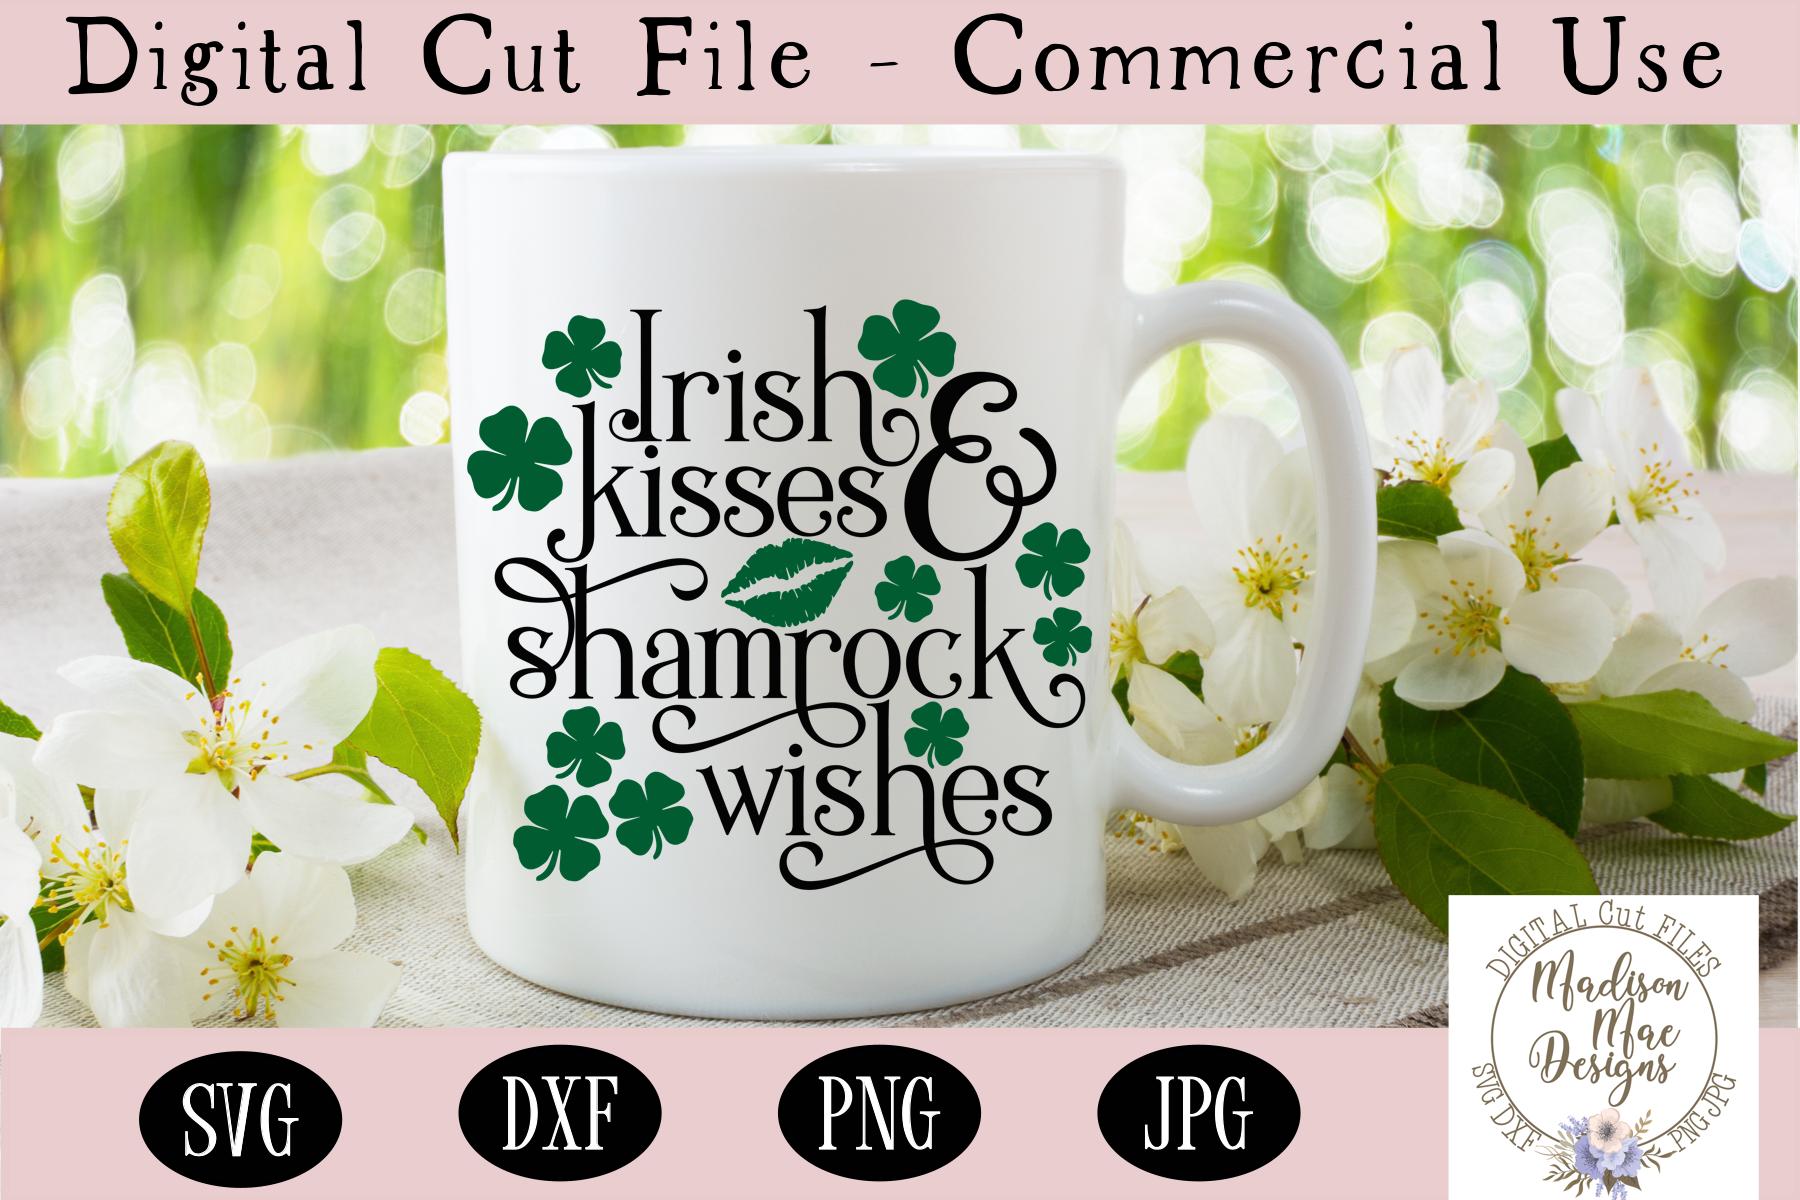 St Patrick's Day SVG, Irish Kisses and Shamrock Wishes SVG example image 1